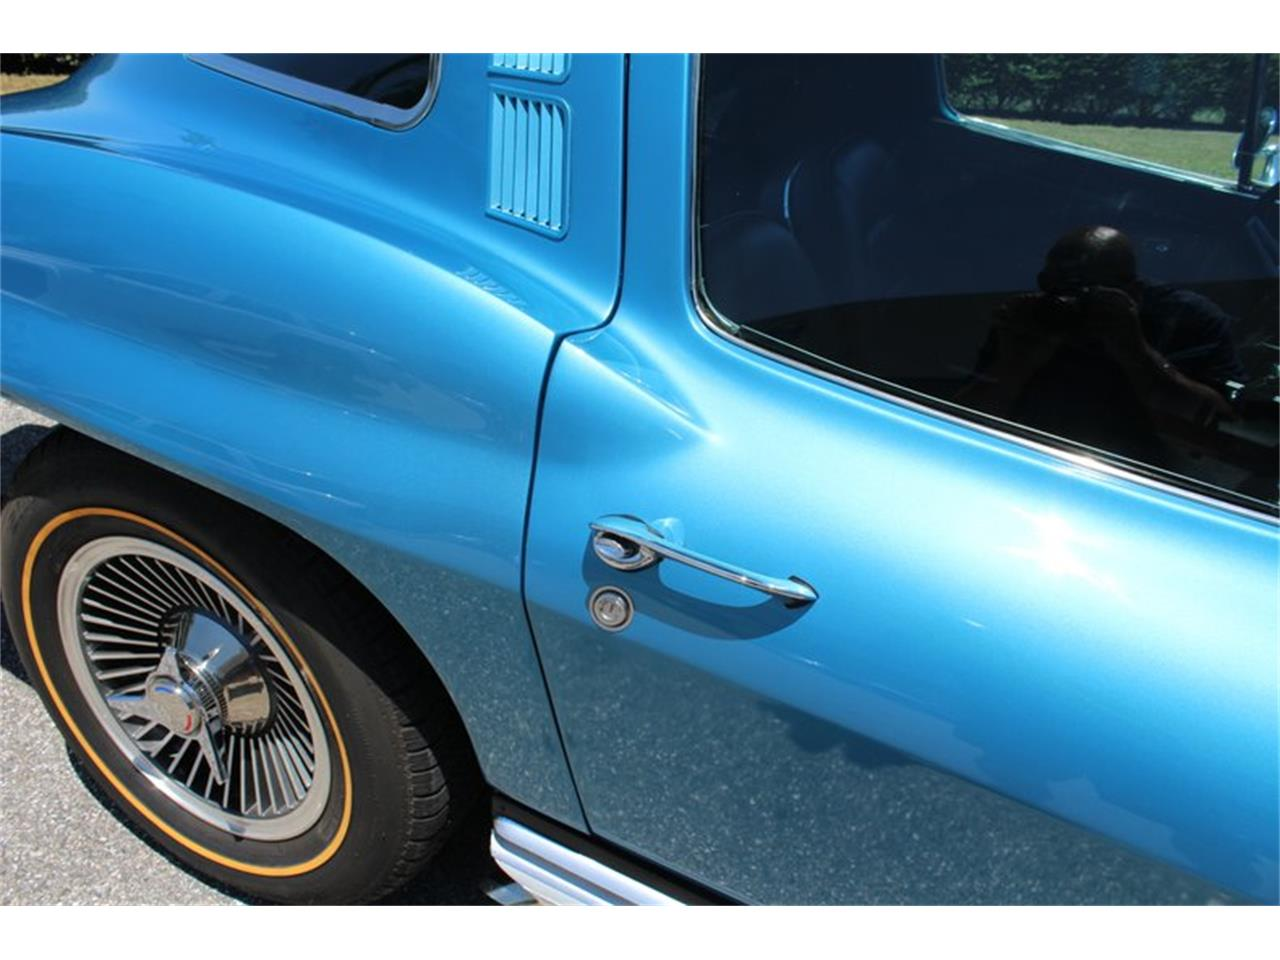 Large Picture of Classic '65 Chevrolet Corvette located in Sarasota Florida - $69,500.00 - QSRR